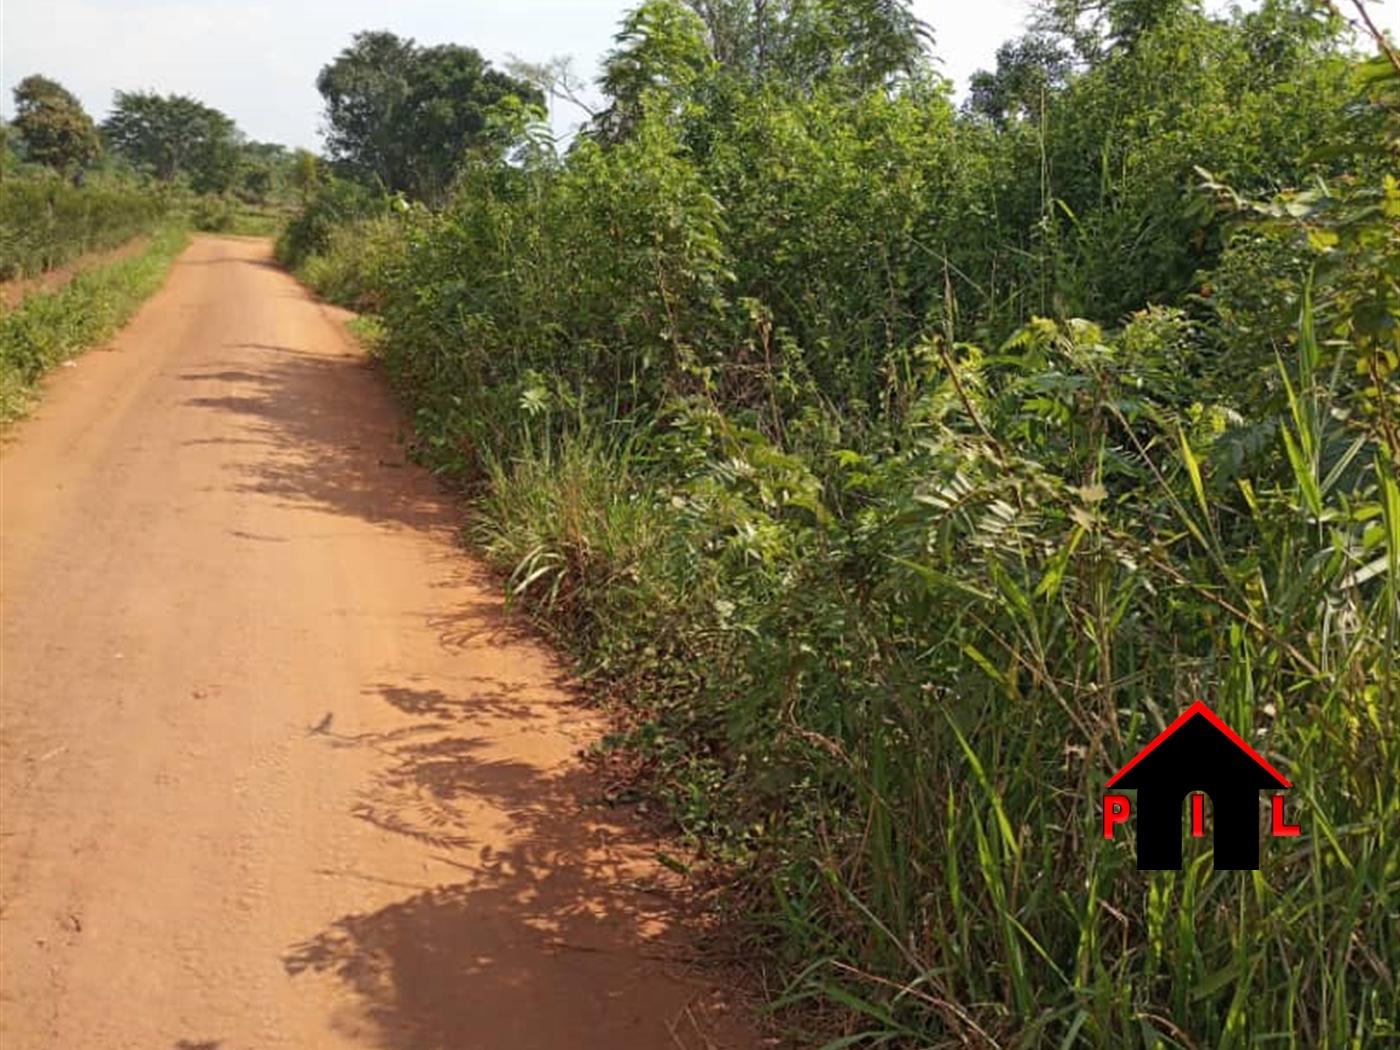 Residential Land for sale in Bukalango Wakiso